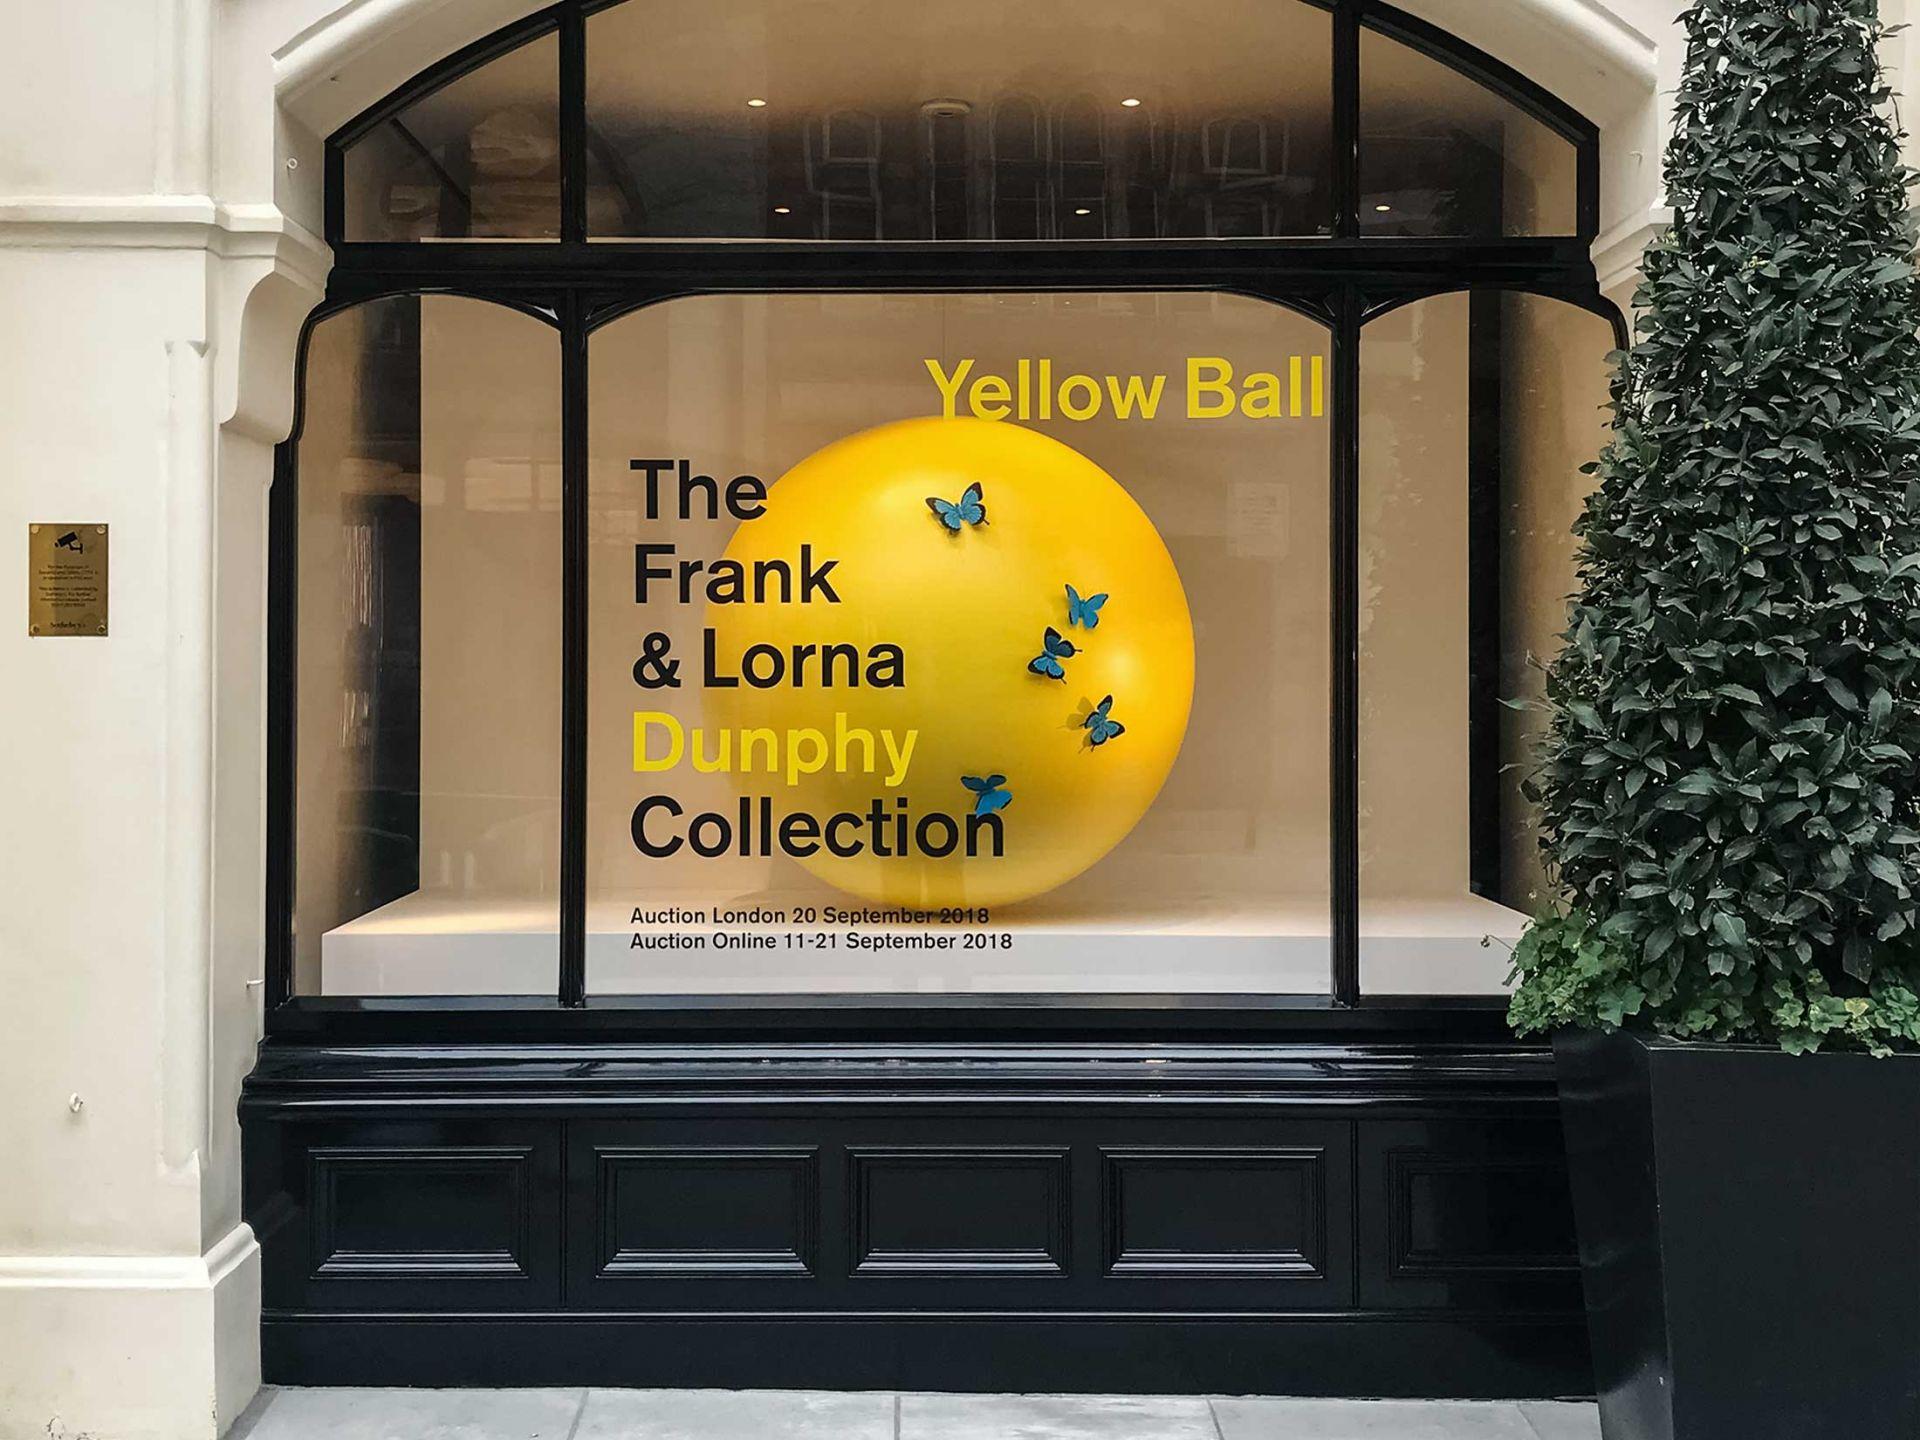 Giant yellow ball prop in window display.